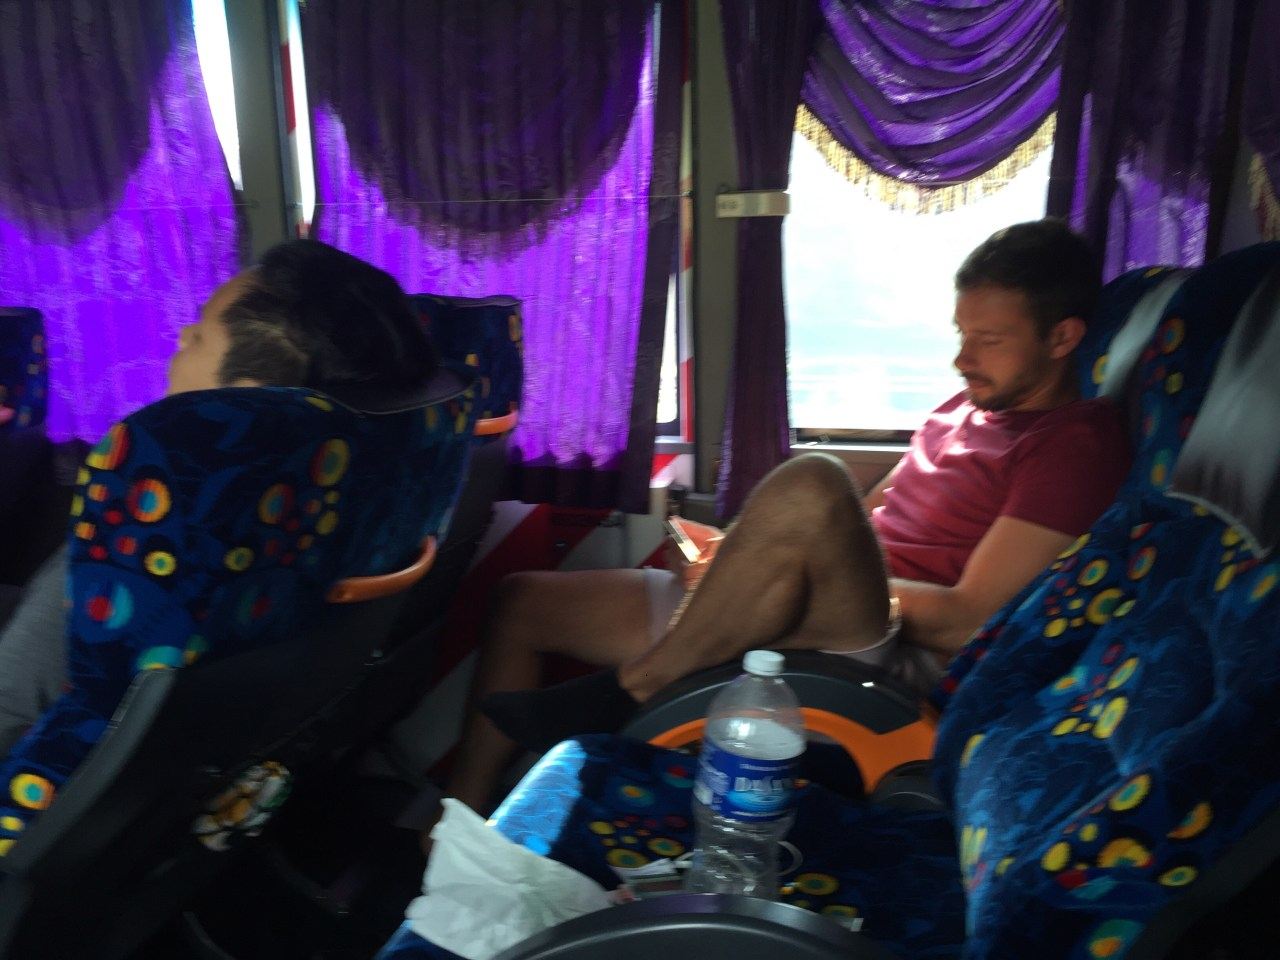 Bus W*nkers